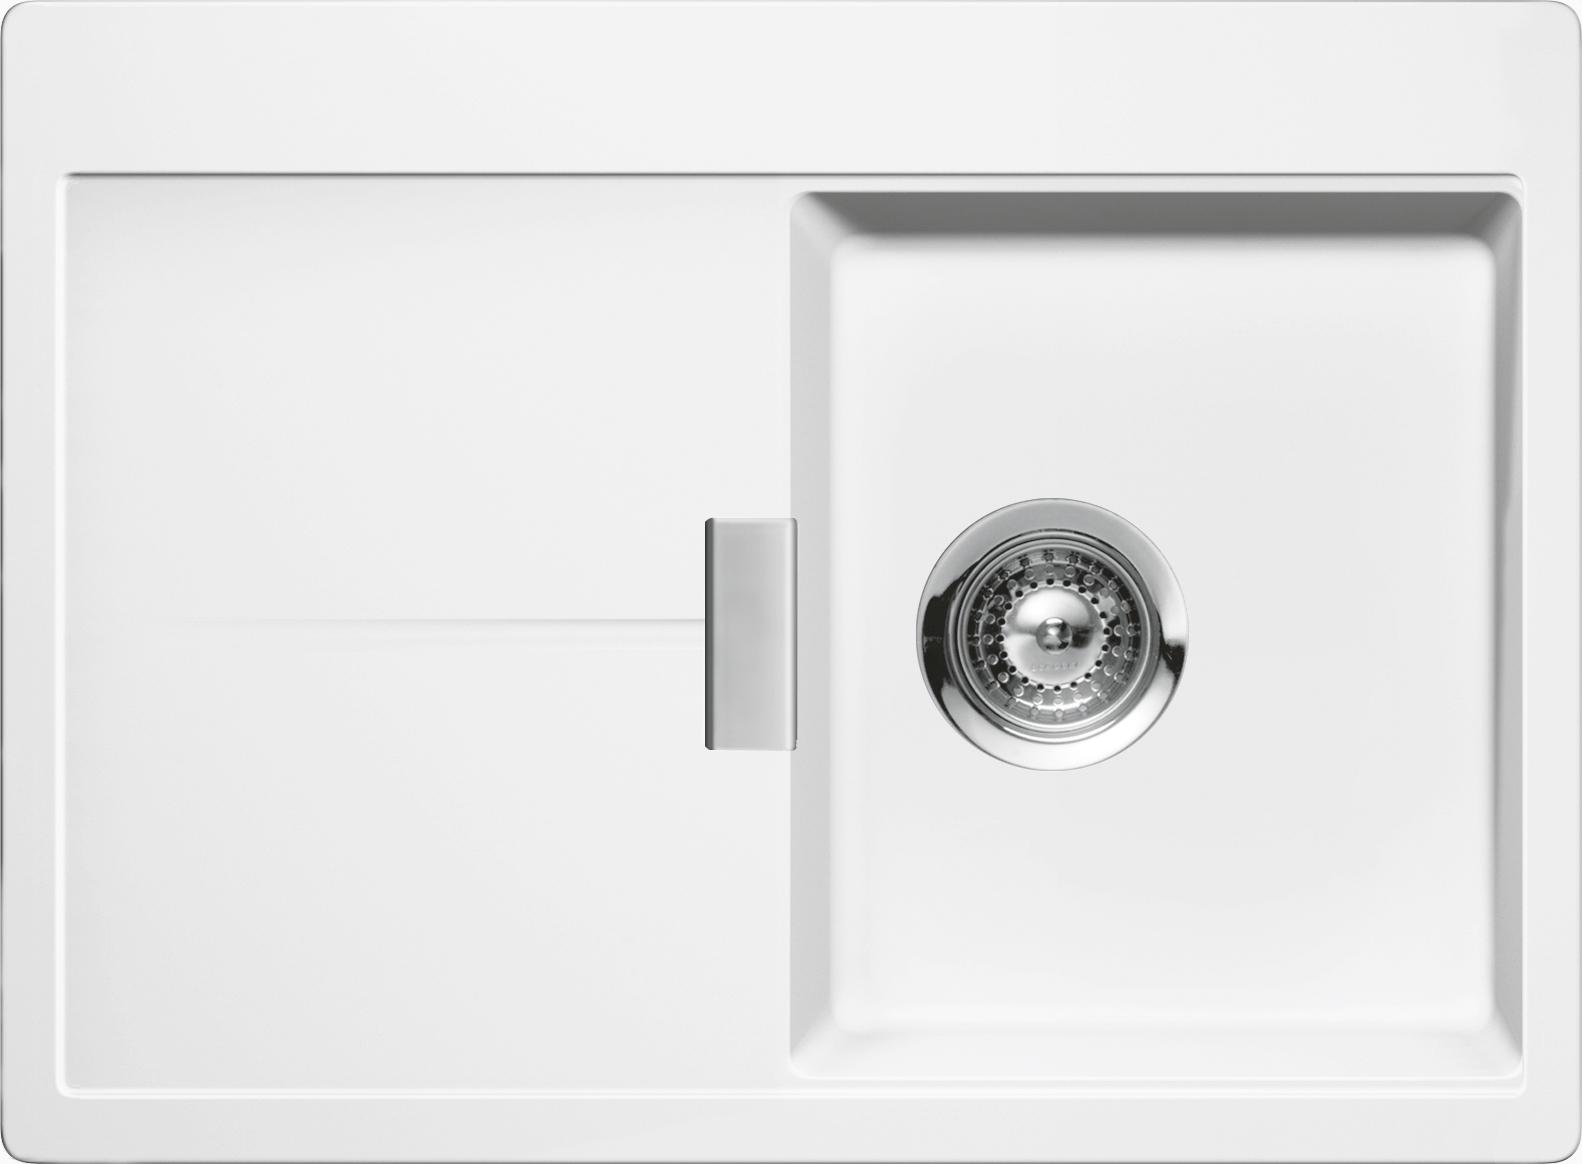 d ezy schock cristadur jednod ezy s odkapem schock horizont d 100s polaris granitov. Black Bedroom Furniture Sets. Home Design Ideas